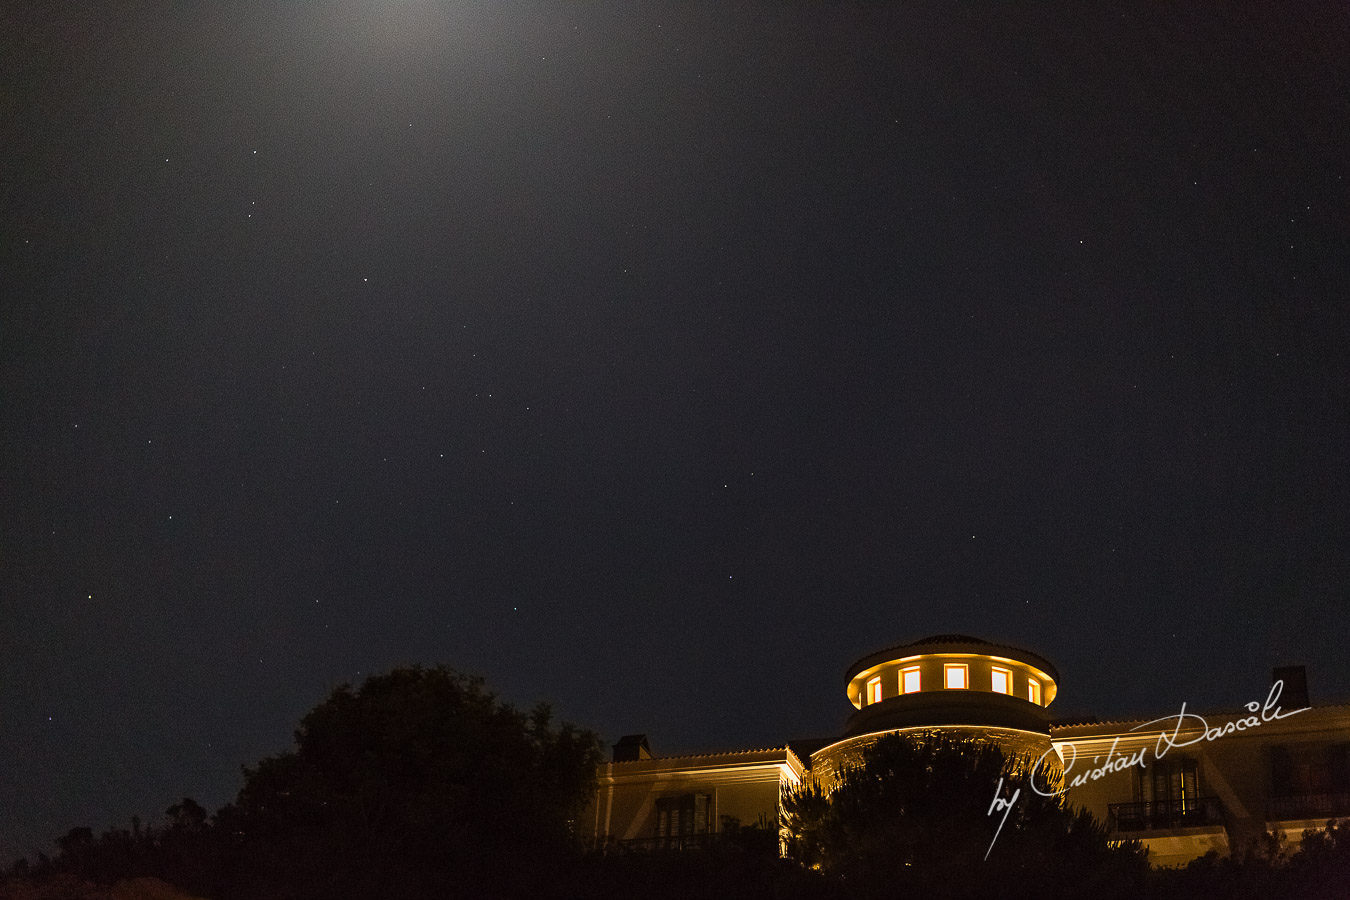 Stunning night photo at the beautiful Anassa Hotel photographed by Cyprus Photographer Cristian Dascalu.